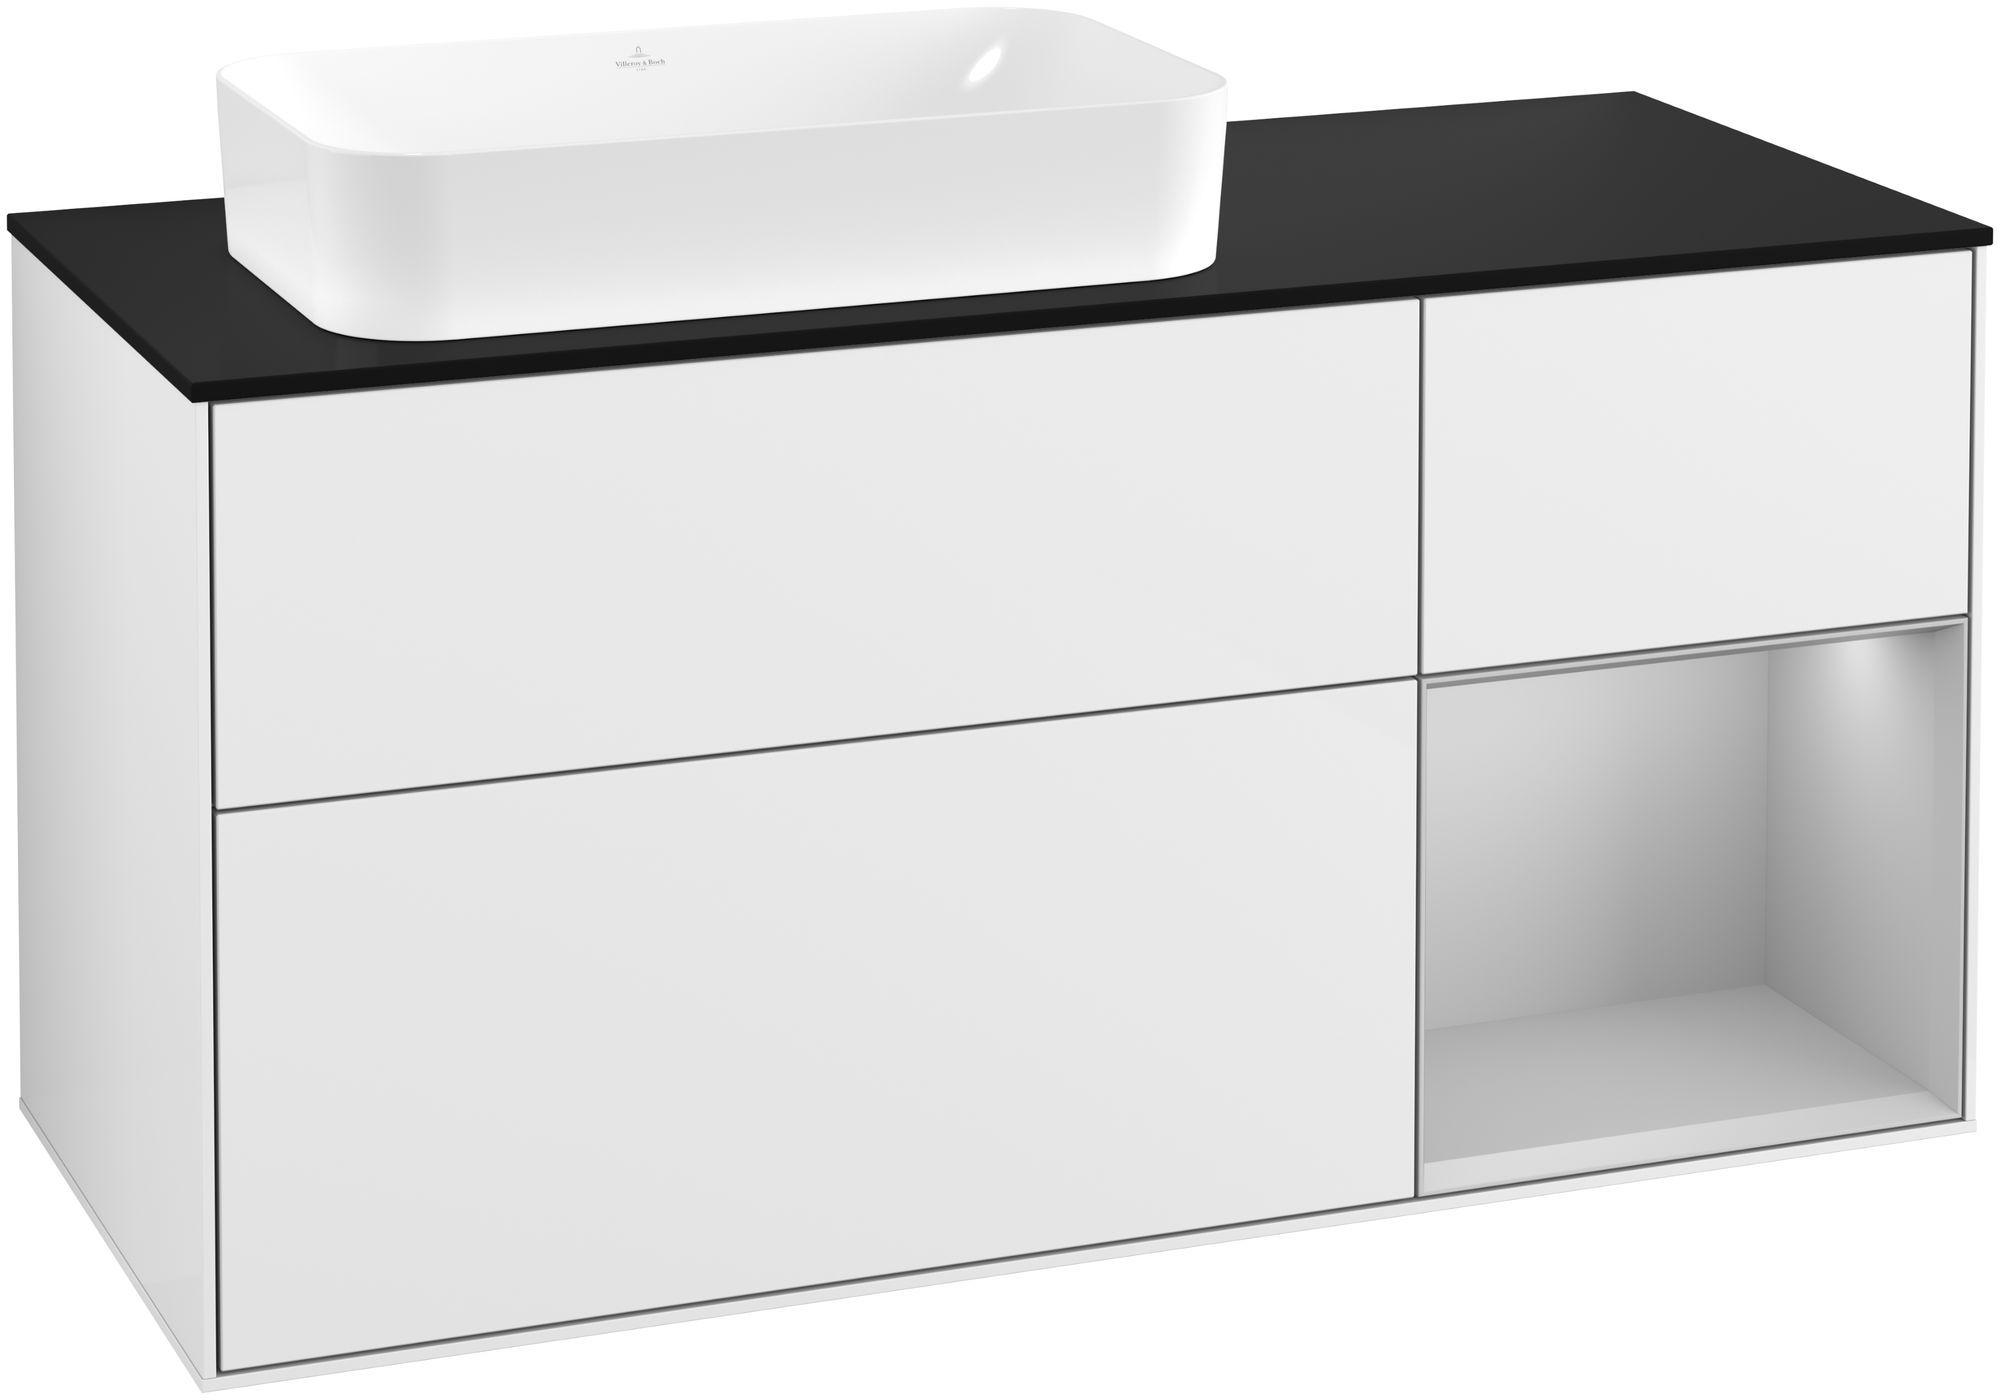 Villeroy & Boch Finion F28 Waschtischunterschrank mit Regalelement 3 Auszüge Waschtisch links LED-Beleuchtung B:120xH:60,3xT:50,1cm Front, Korpus: Glossy White Lack, Regal: Light Grey Matt, Glasplatte: Black Matt F282GJGF